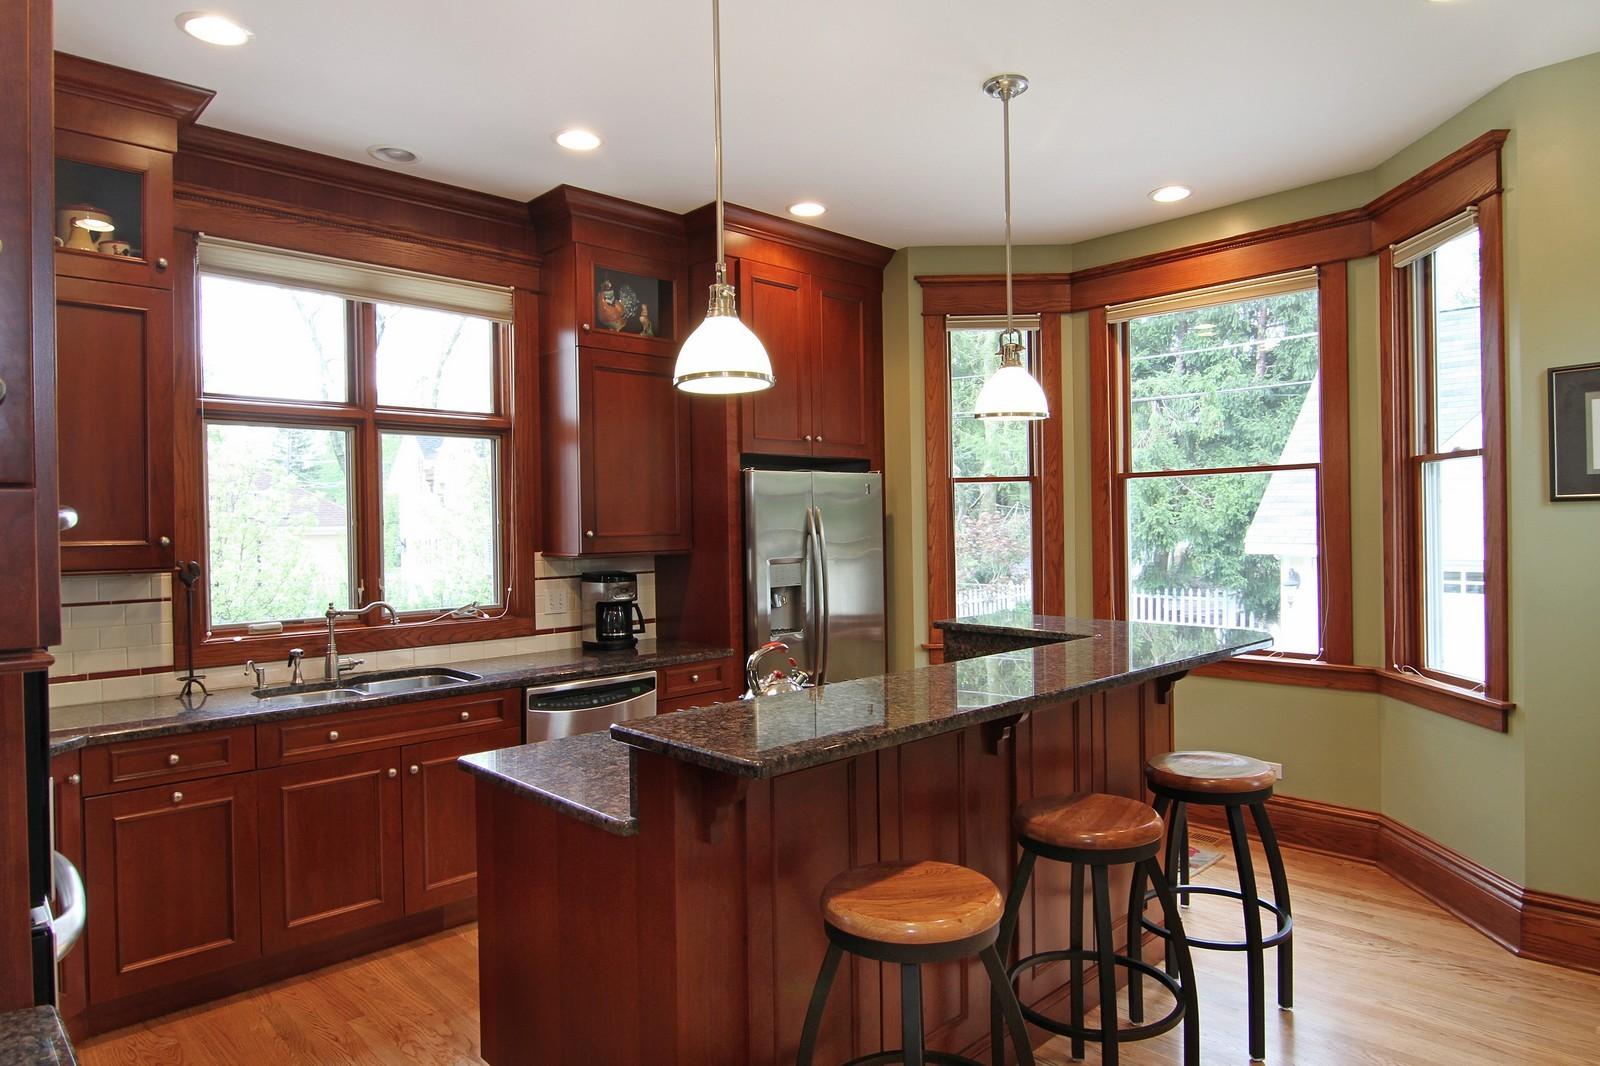 Real Estate Photography - 228 LaGrange Rd, La Grange, IL, 60525 - Kitchen